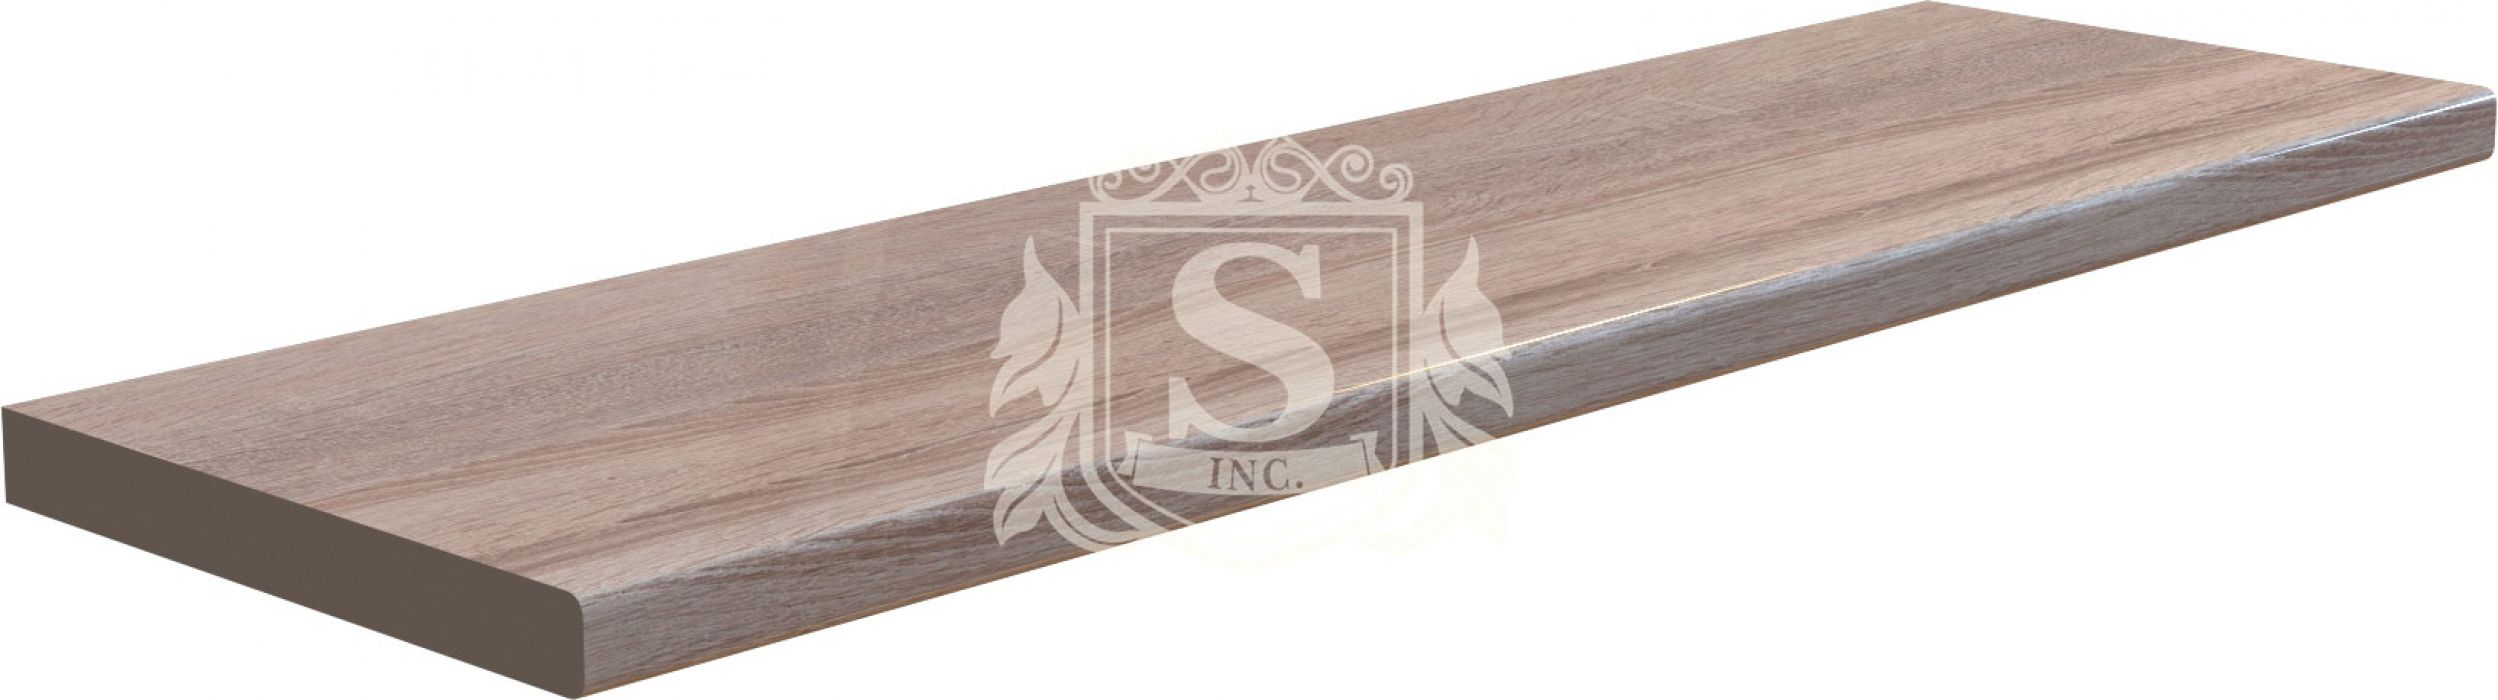 Столешница «Дуб сонома» 1 м.п (28 мм)